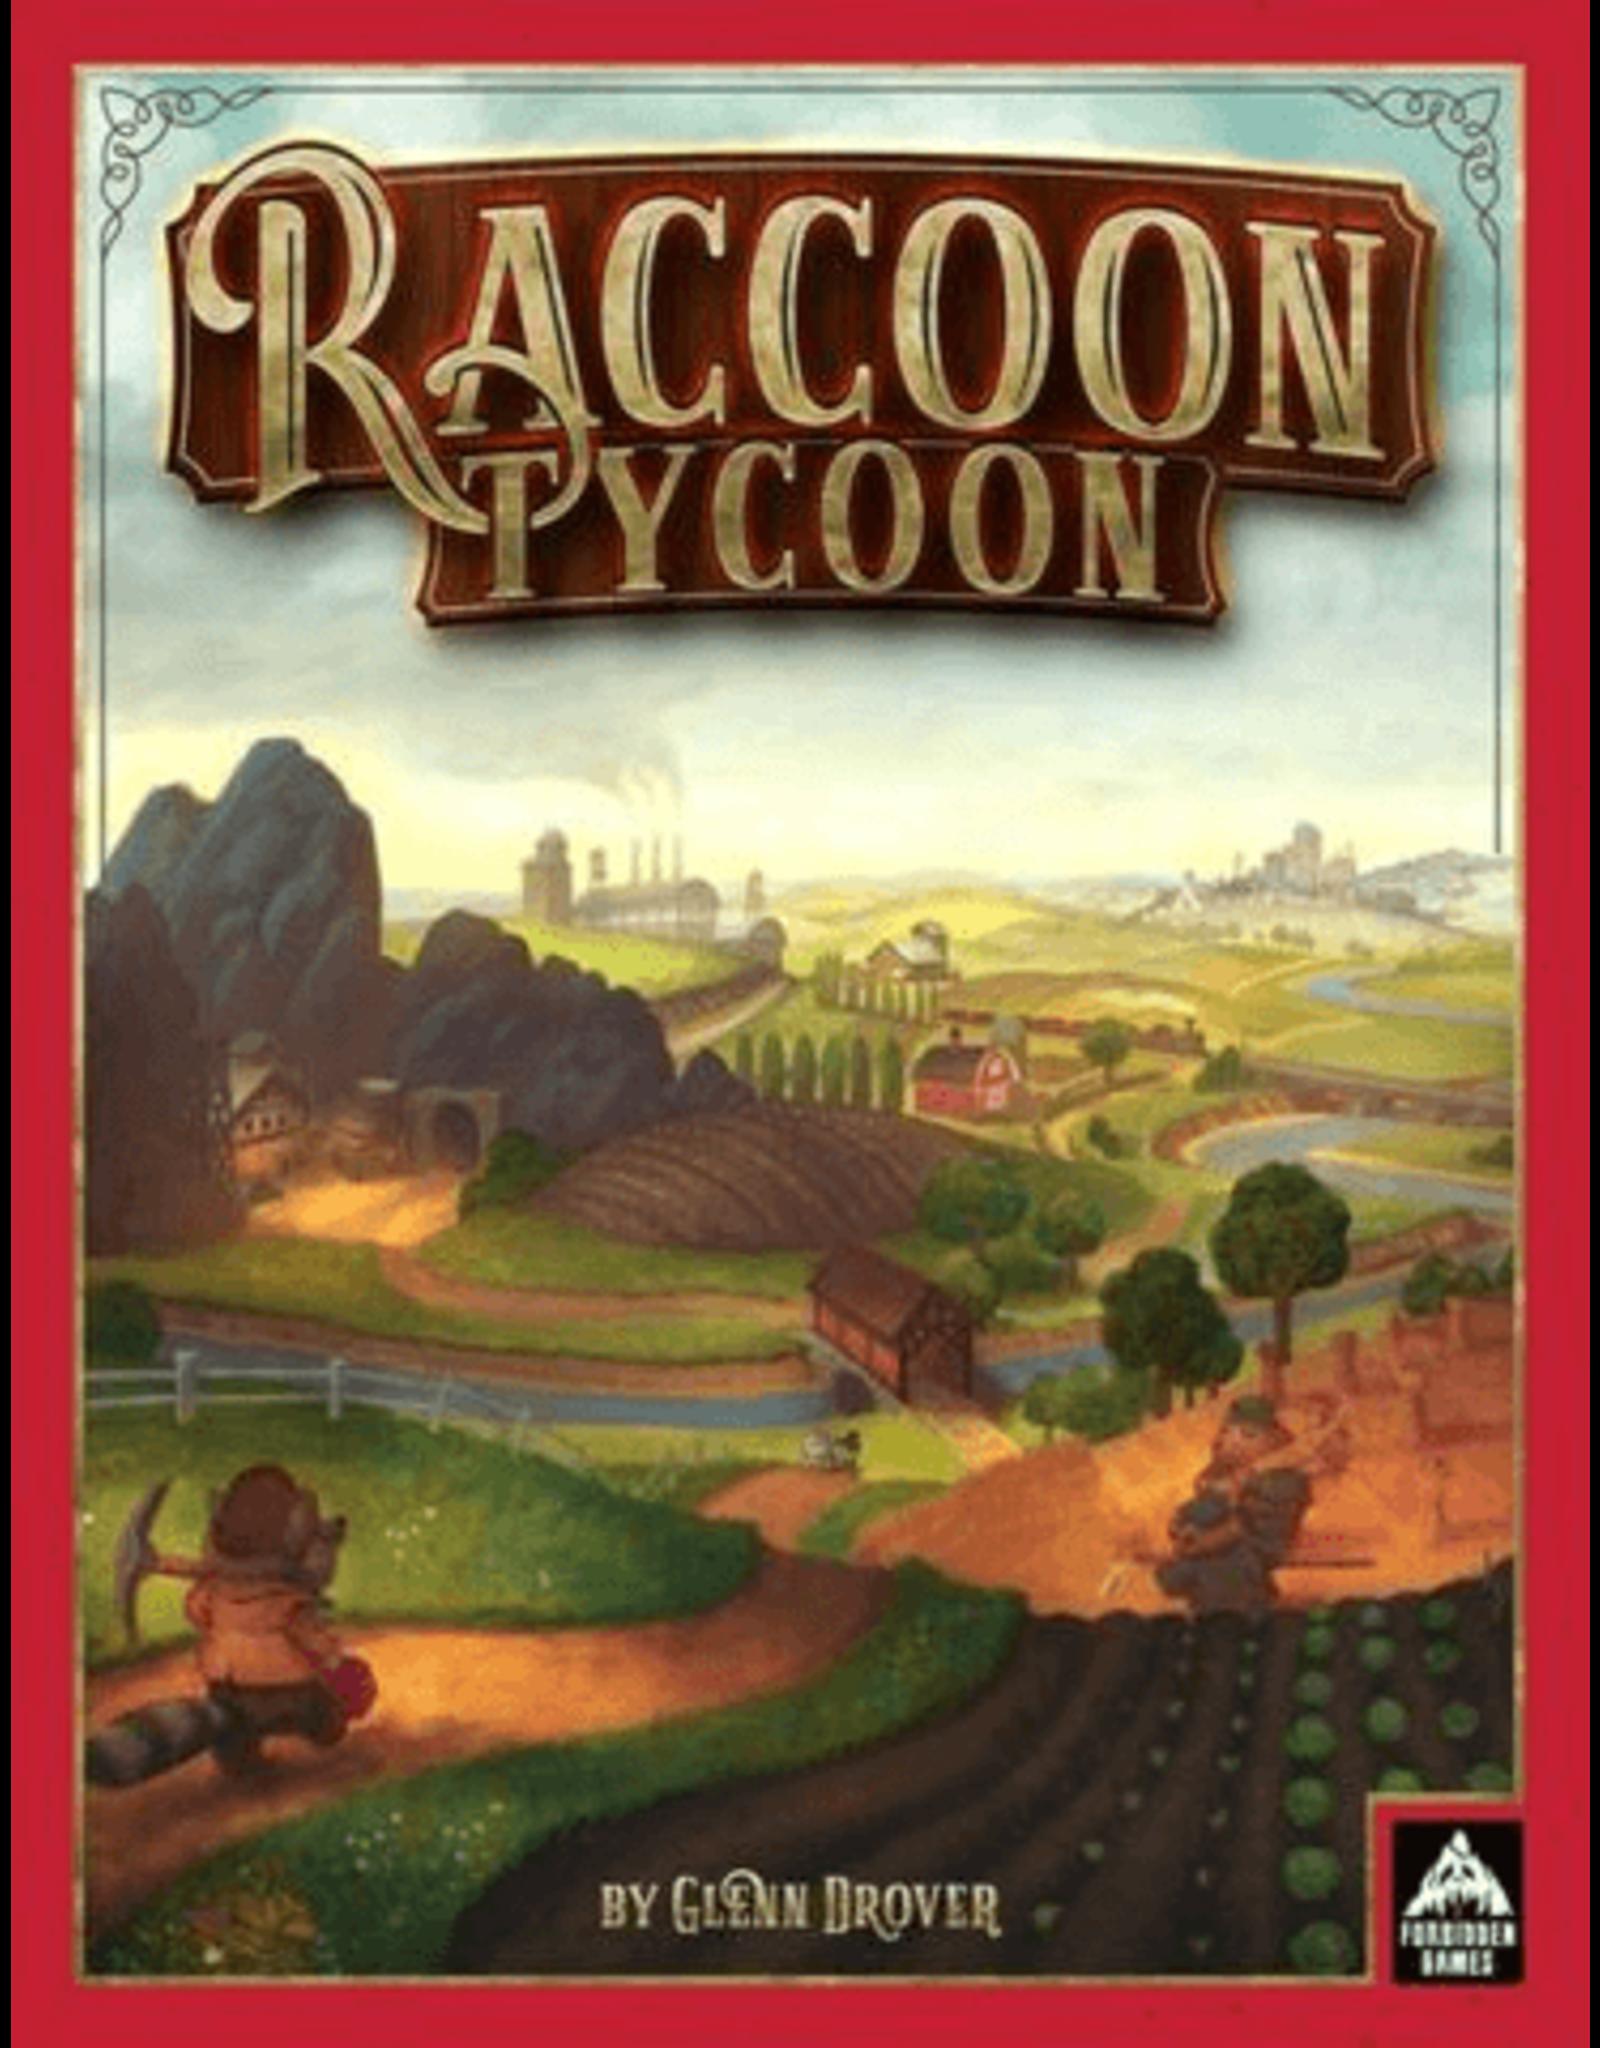 Racoon Tycoon